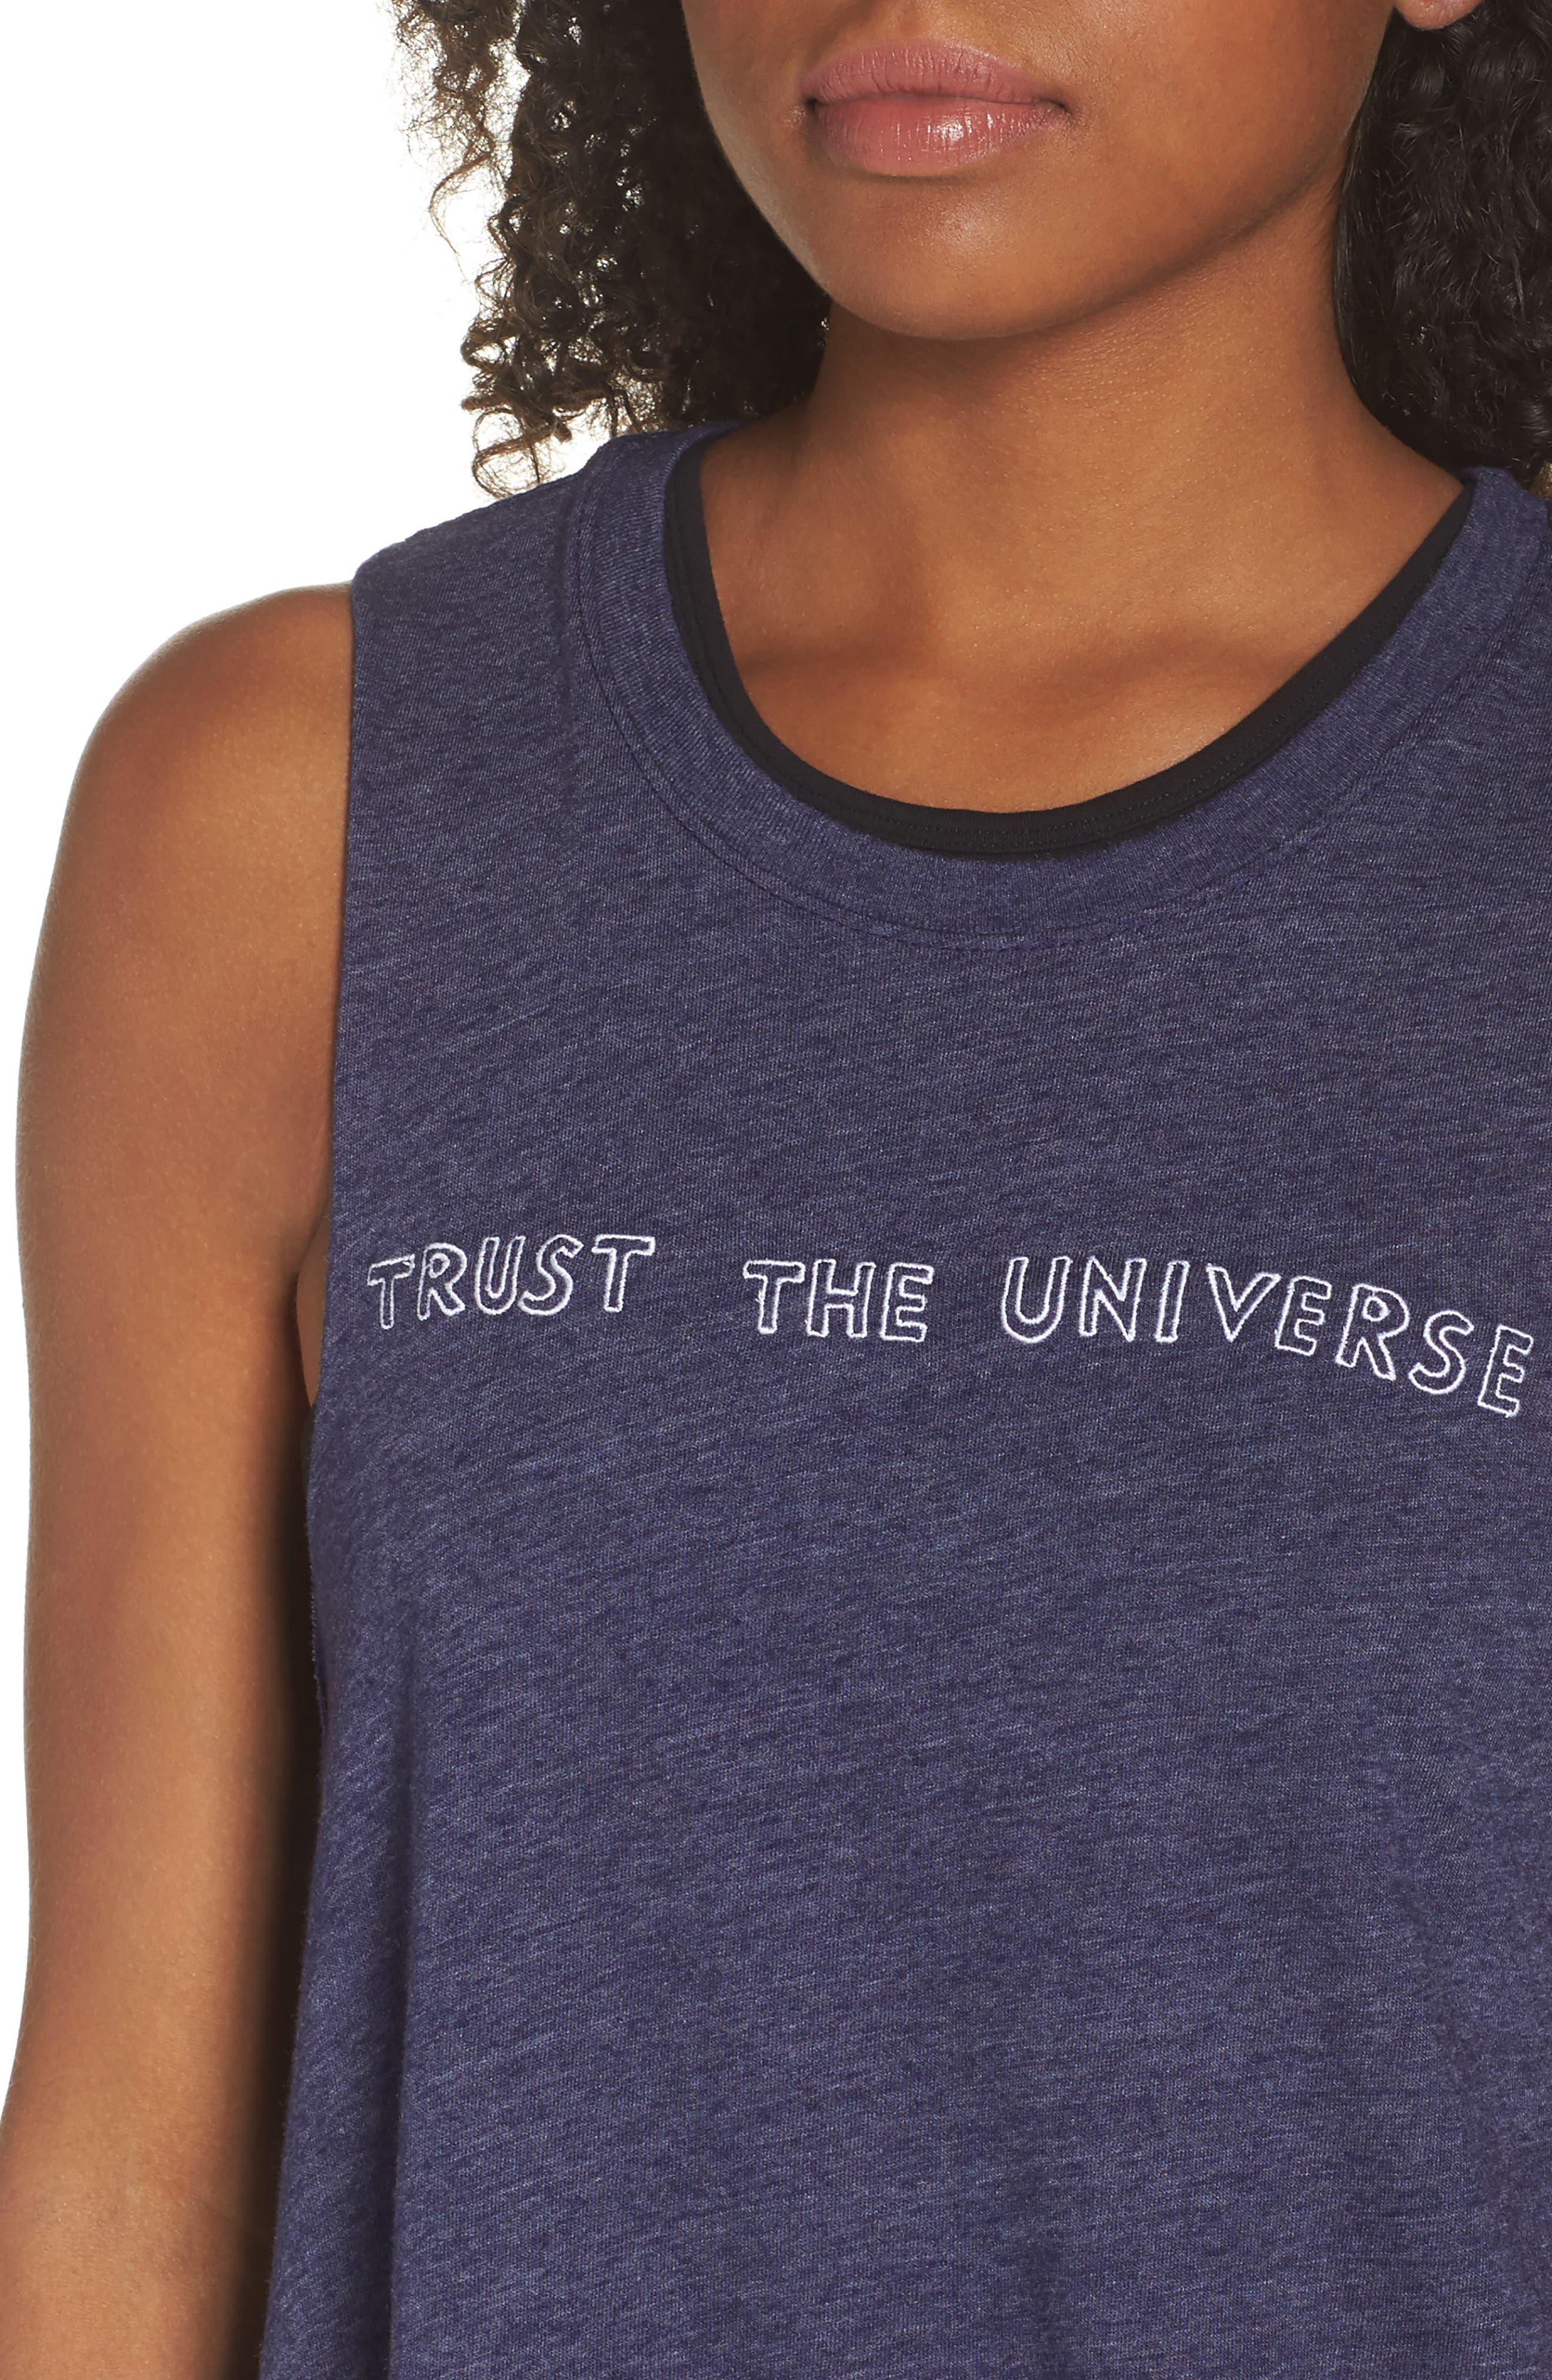 Trust the Universe Crop Tank,                             Alternate thumbnail 4, color,                             410